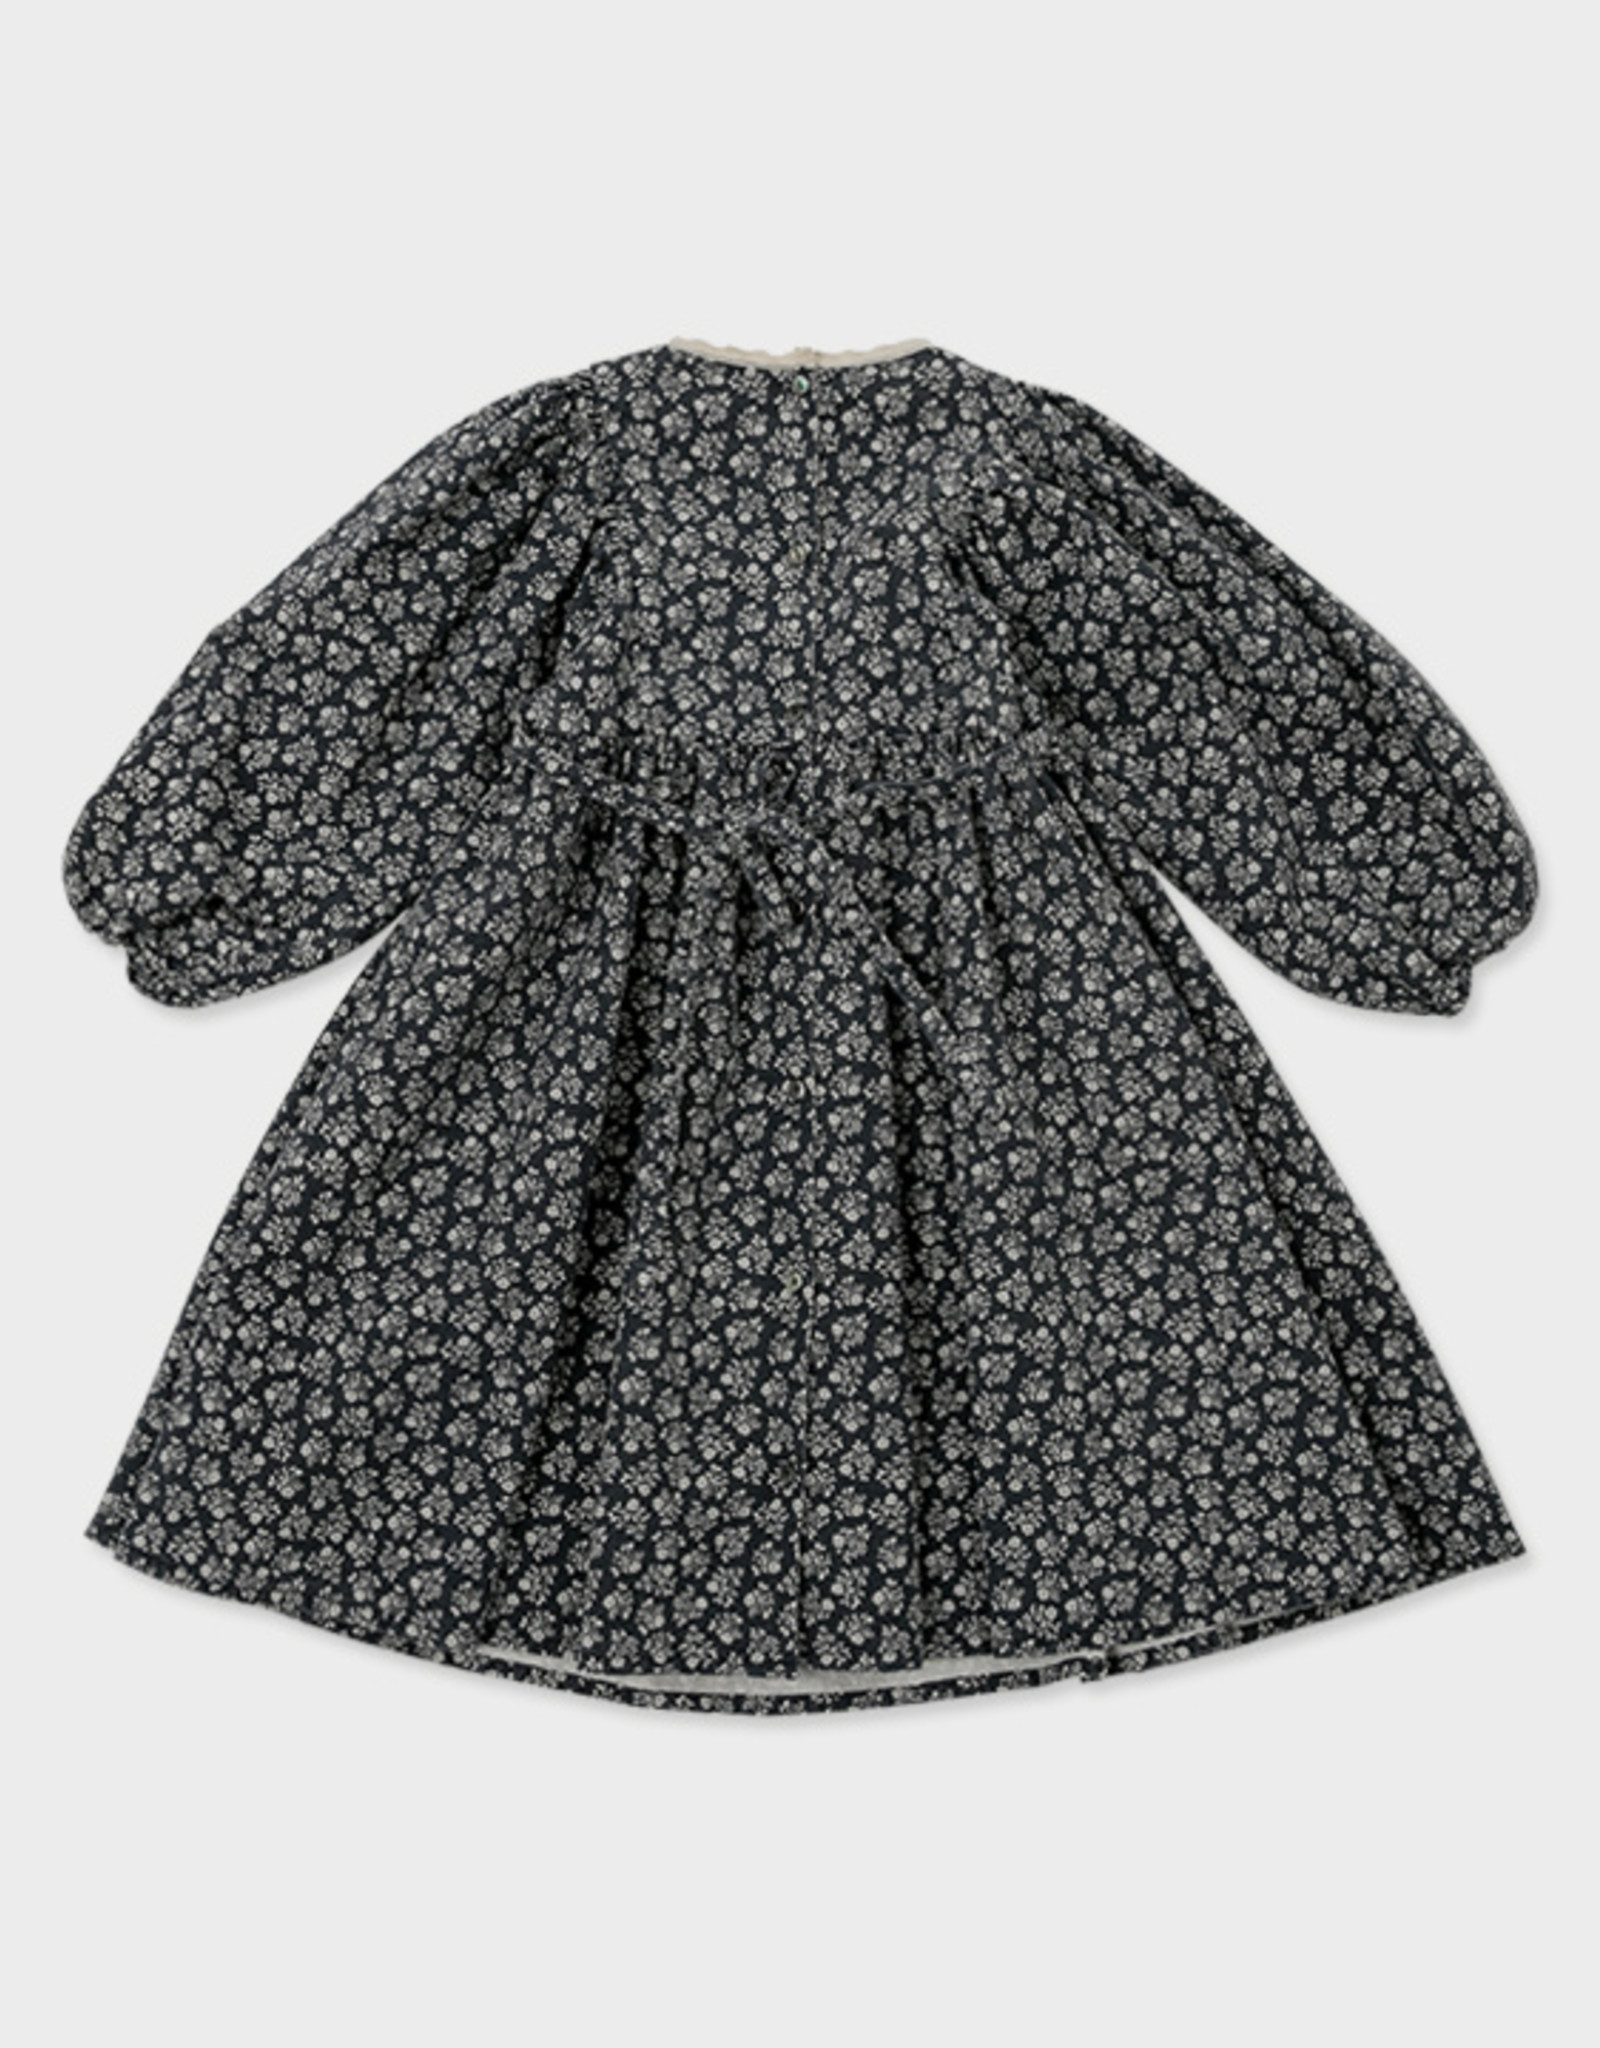 Louisiella Khaleesi dress